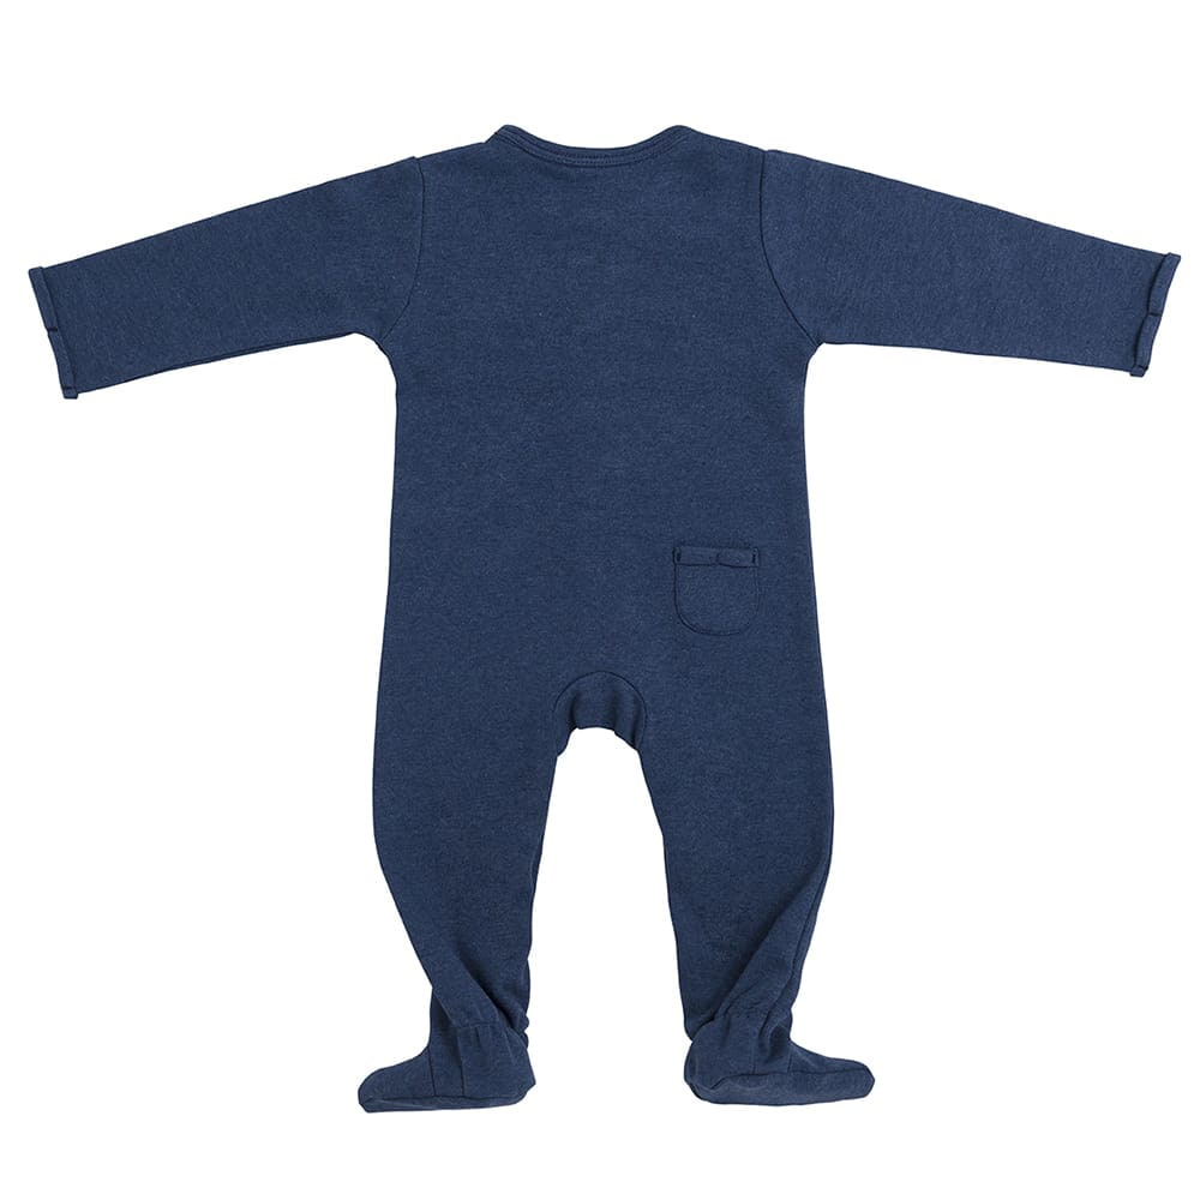 babys only 3546228 boxpakje met voetjes melange 62 jeans 2